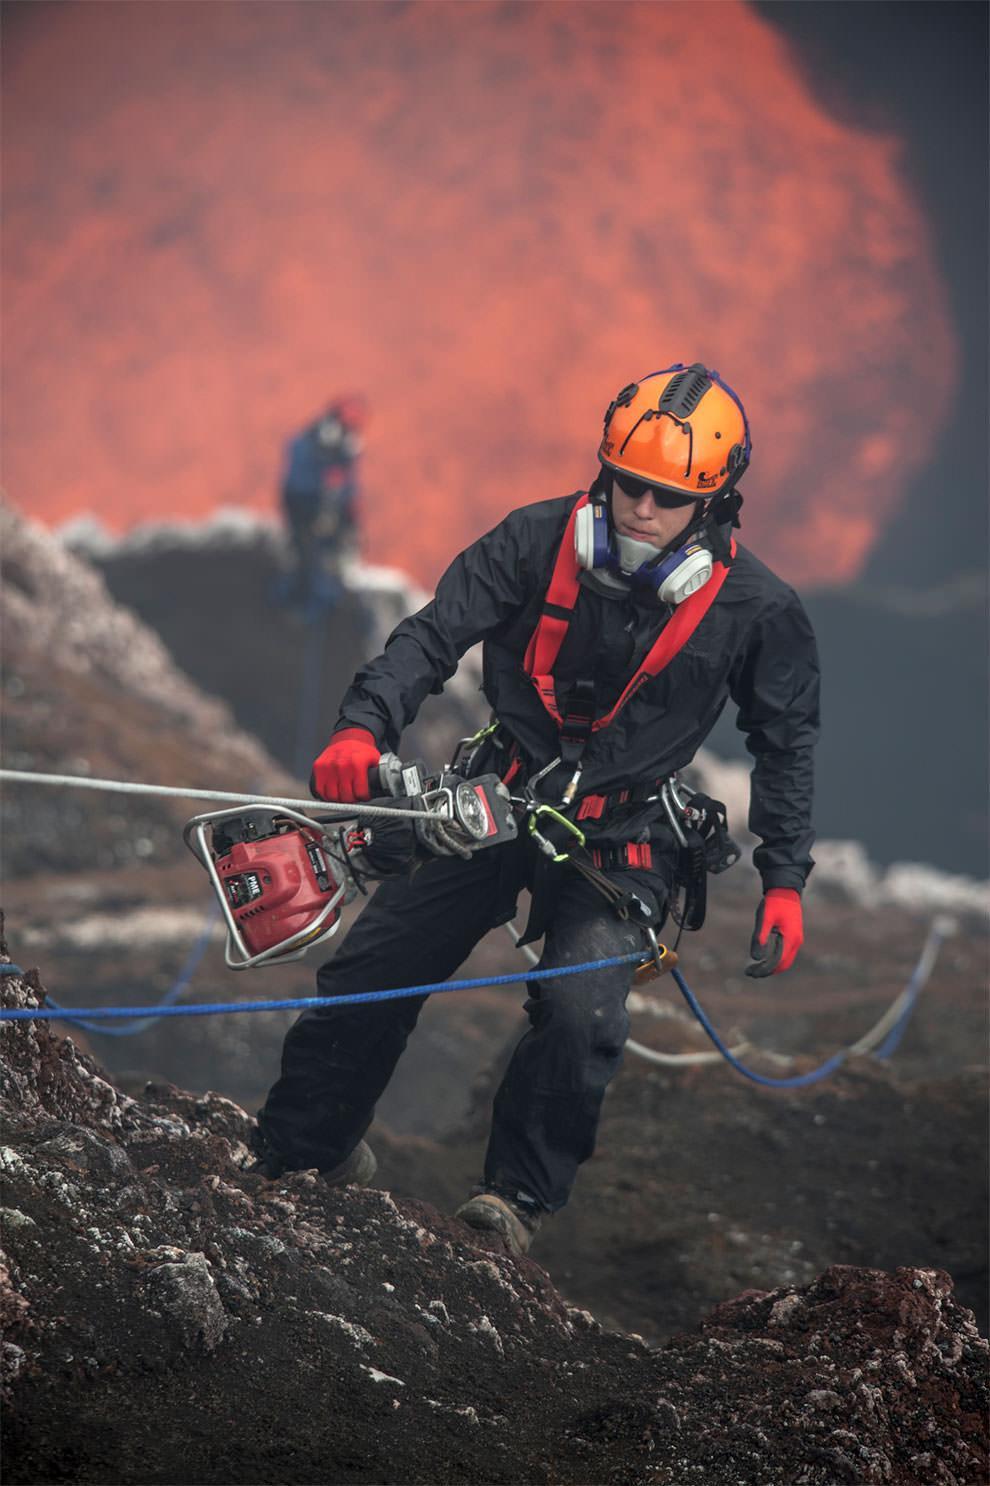 swiateczna-wspinaczka-na-wulkan-marun-3